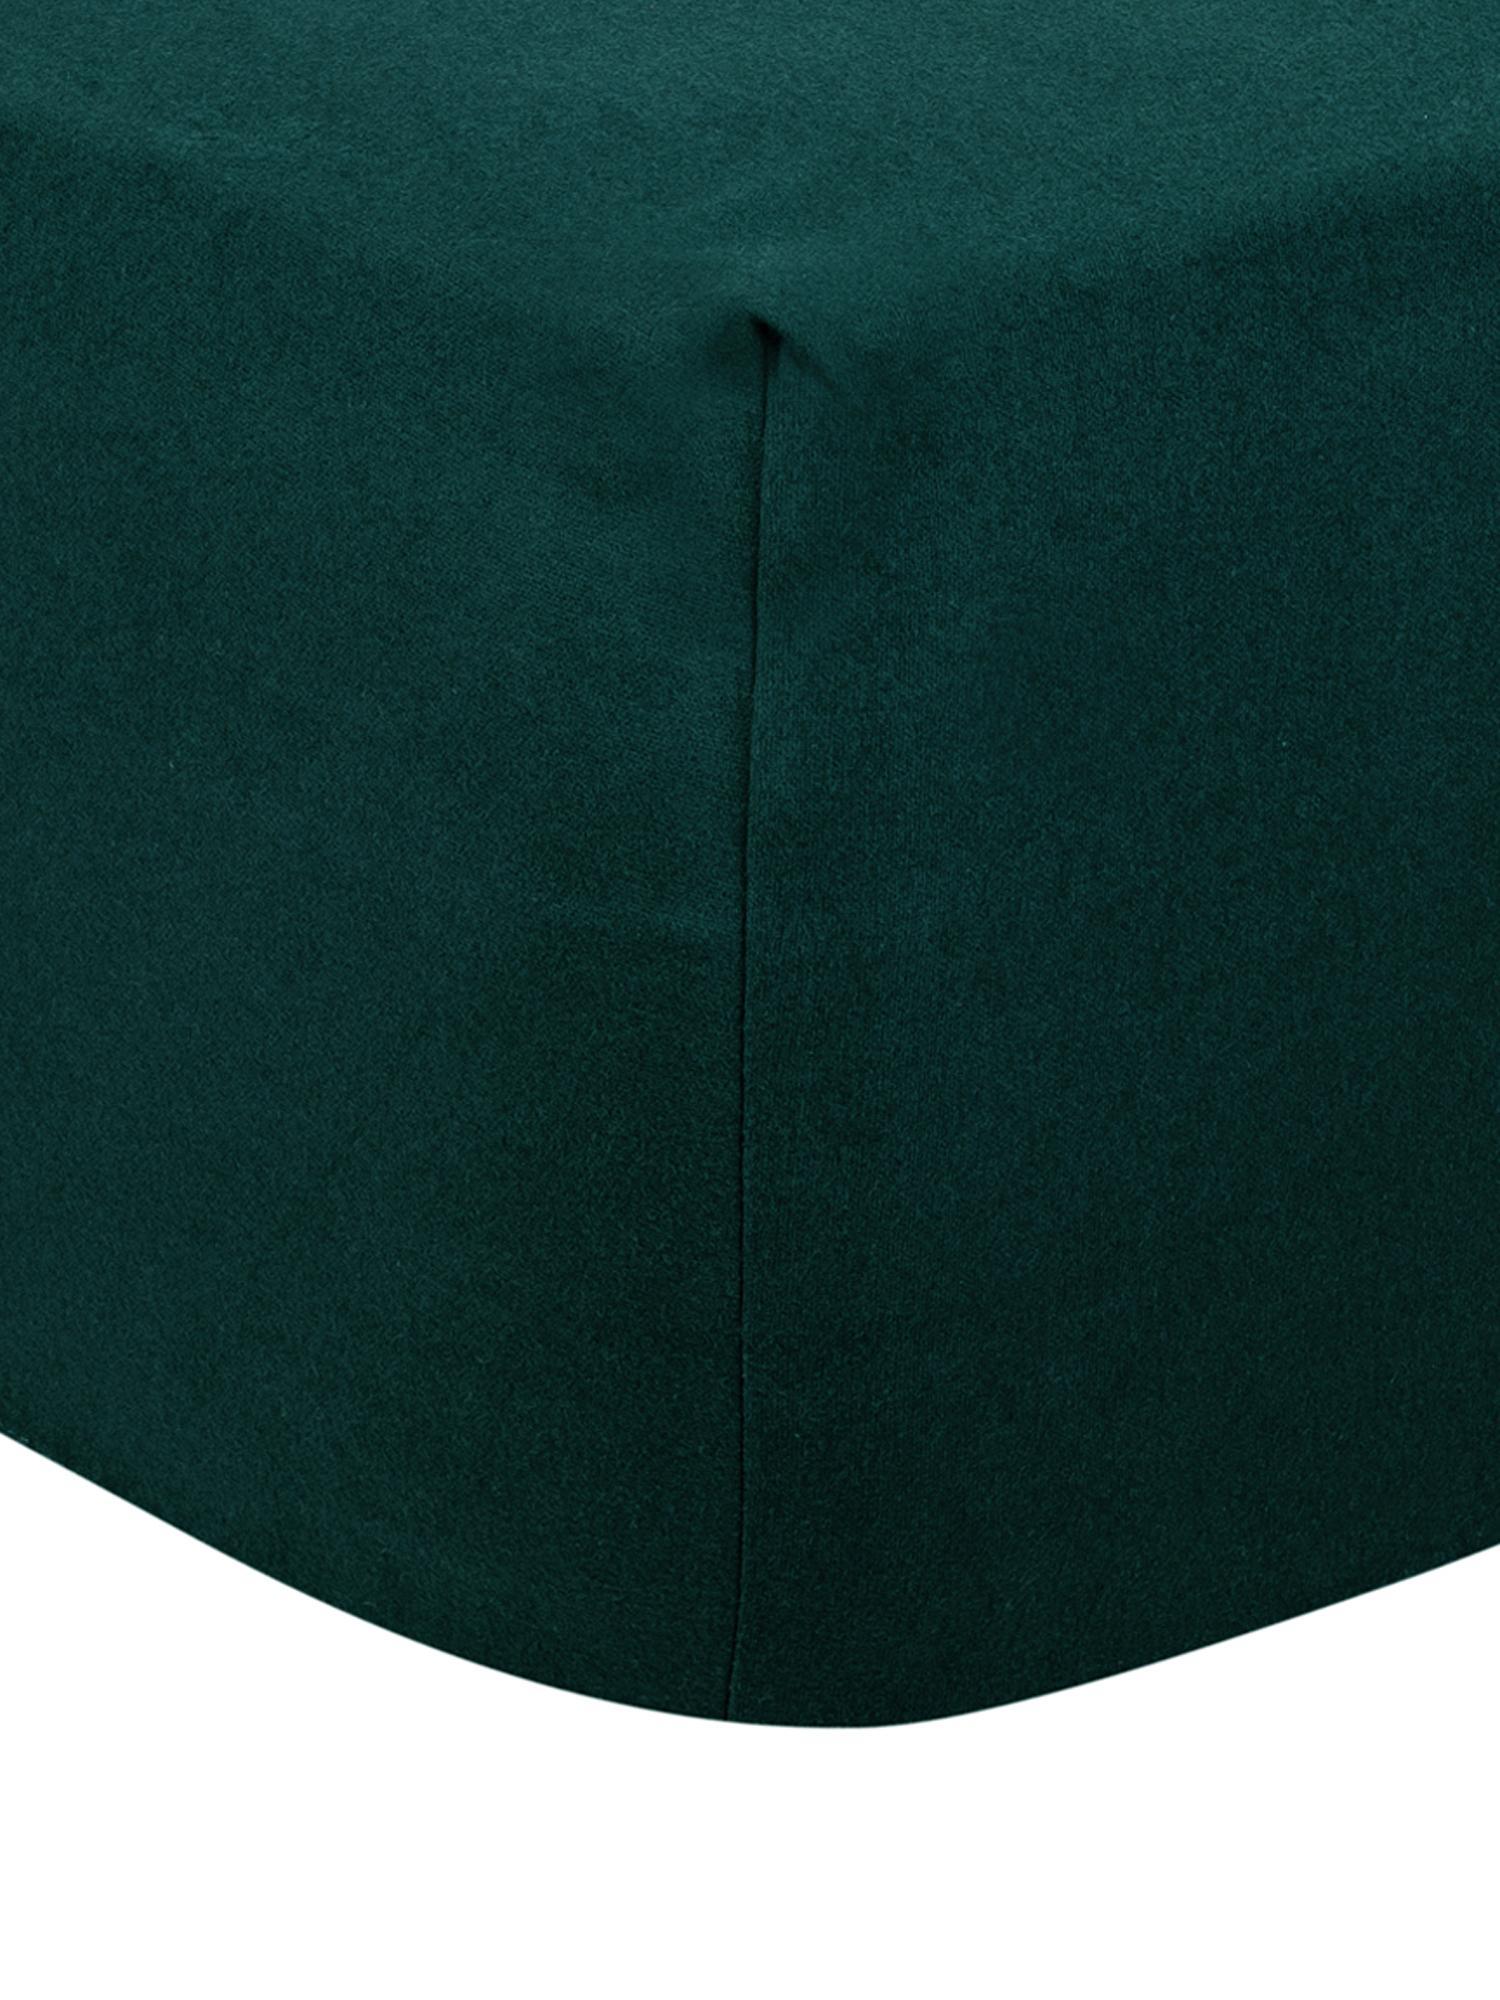 Lenzuolo con angoli in flanella Biba, Tessuto: flanella, Verde bosco, Larg. 90 x Lung. 200 cm